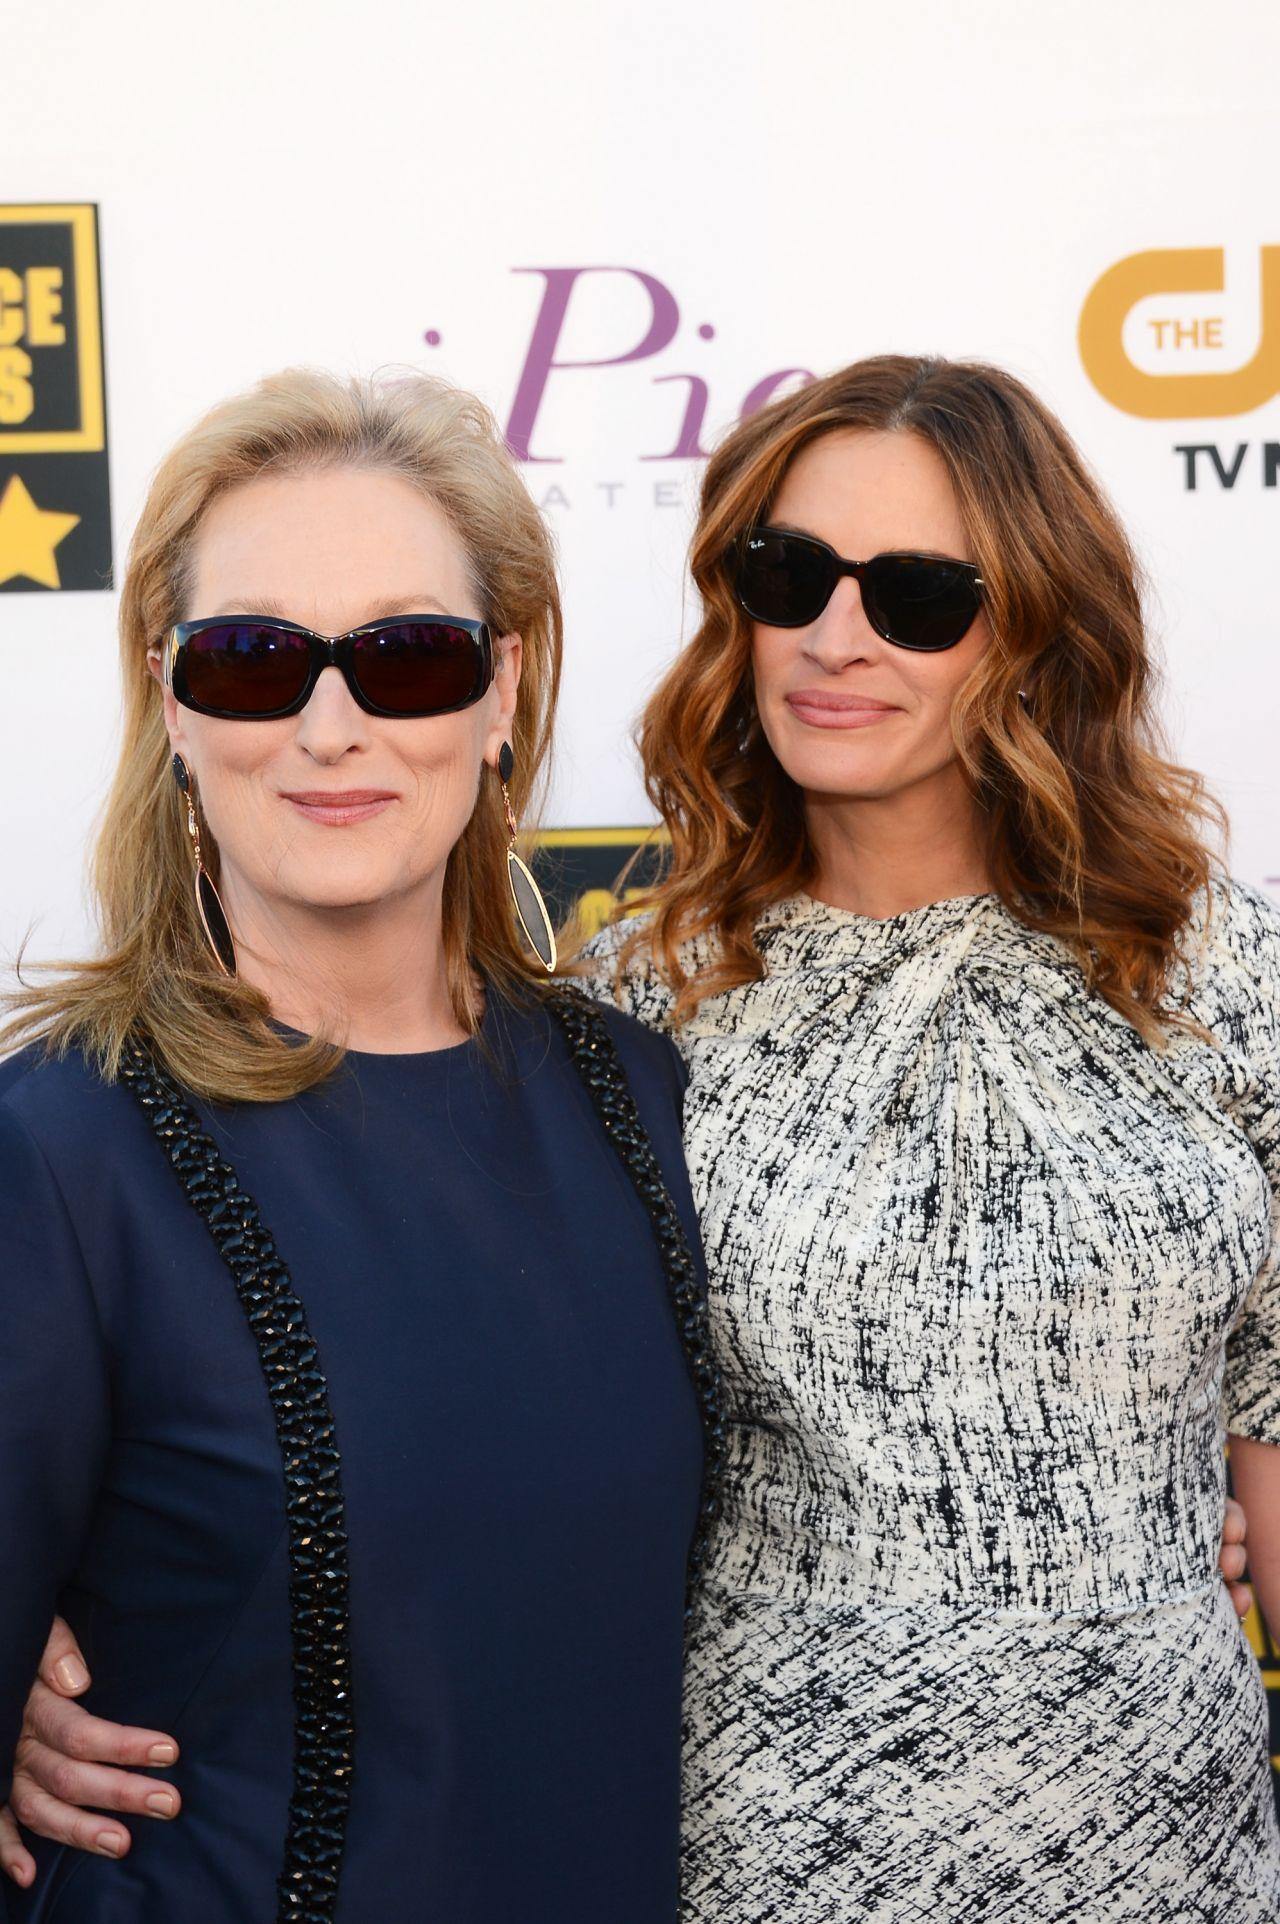 Meryl Streep & Julia Roberts at 19th Annual Critics Choice Movie Awards in Santa Monica, January 2014